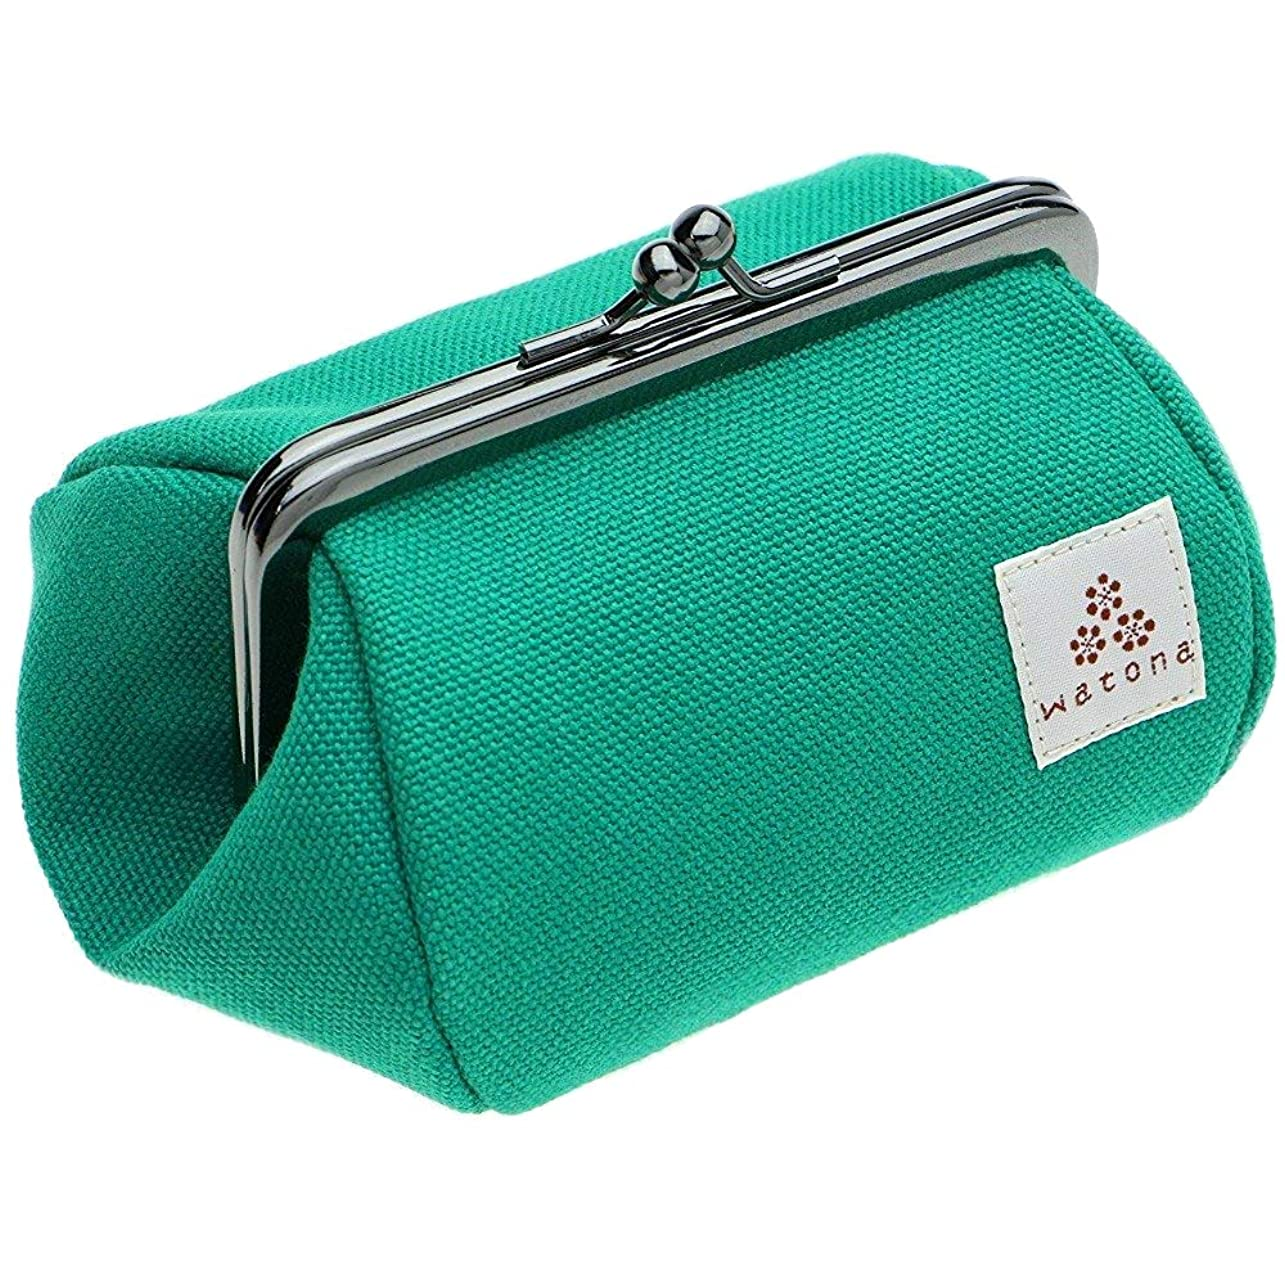 watona 帆布がま口 化粧ポーチ 3.5寸Sサイズ